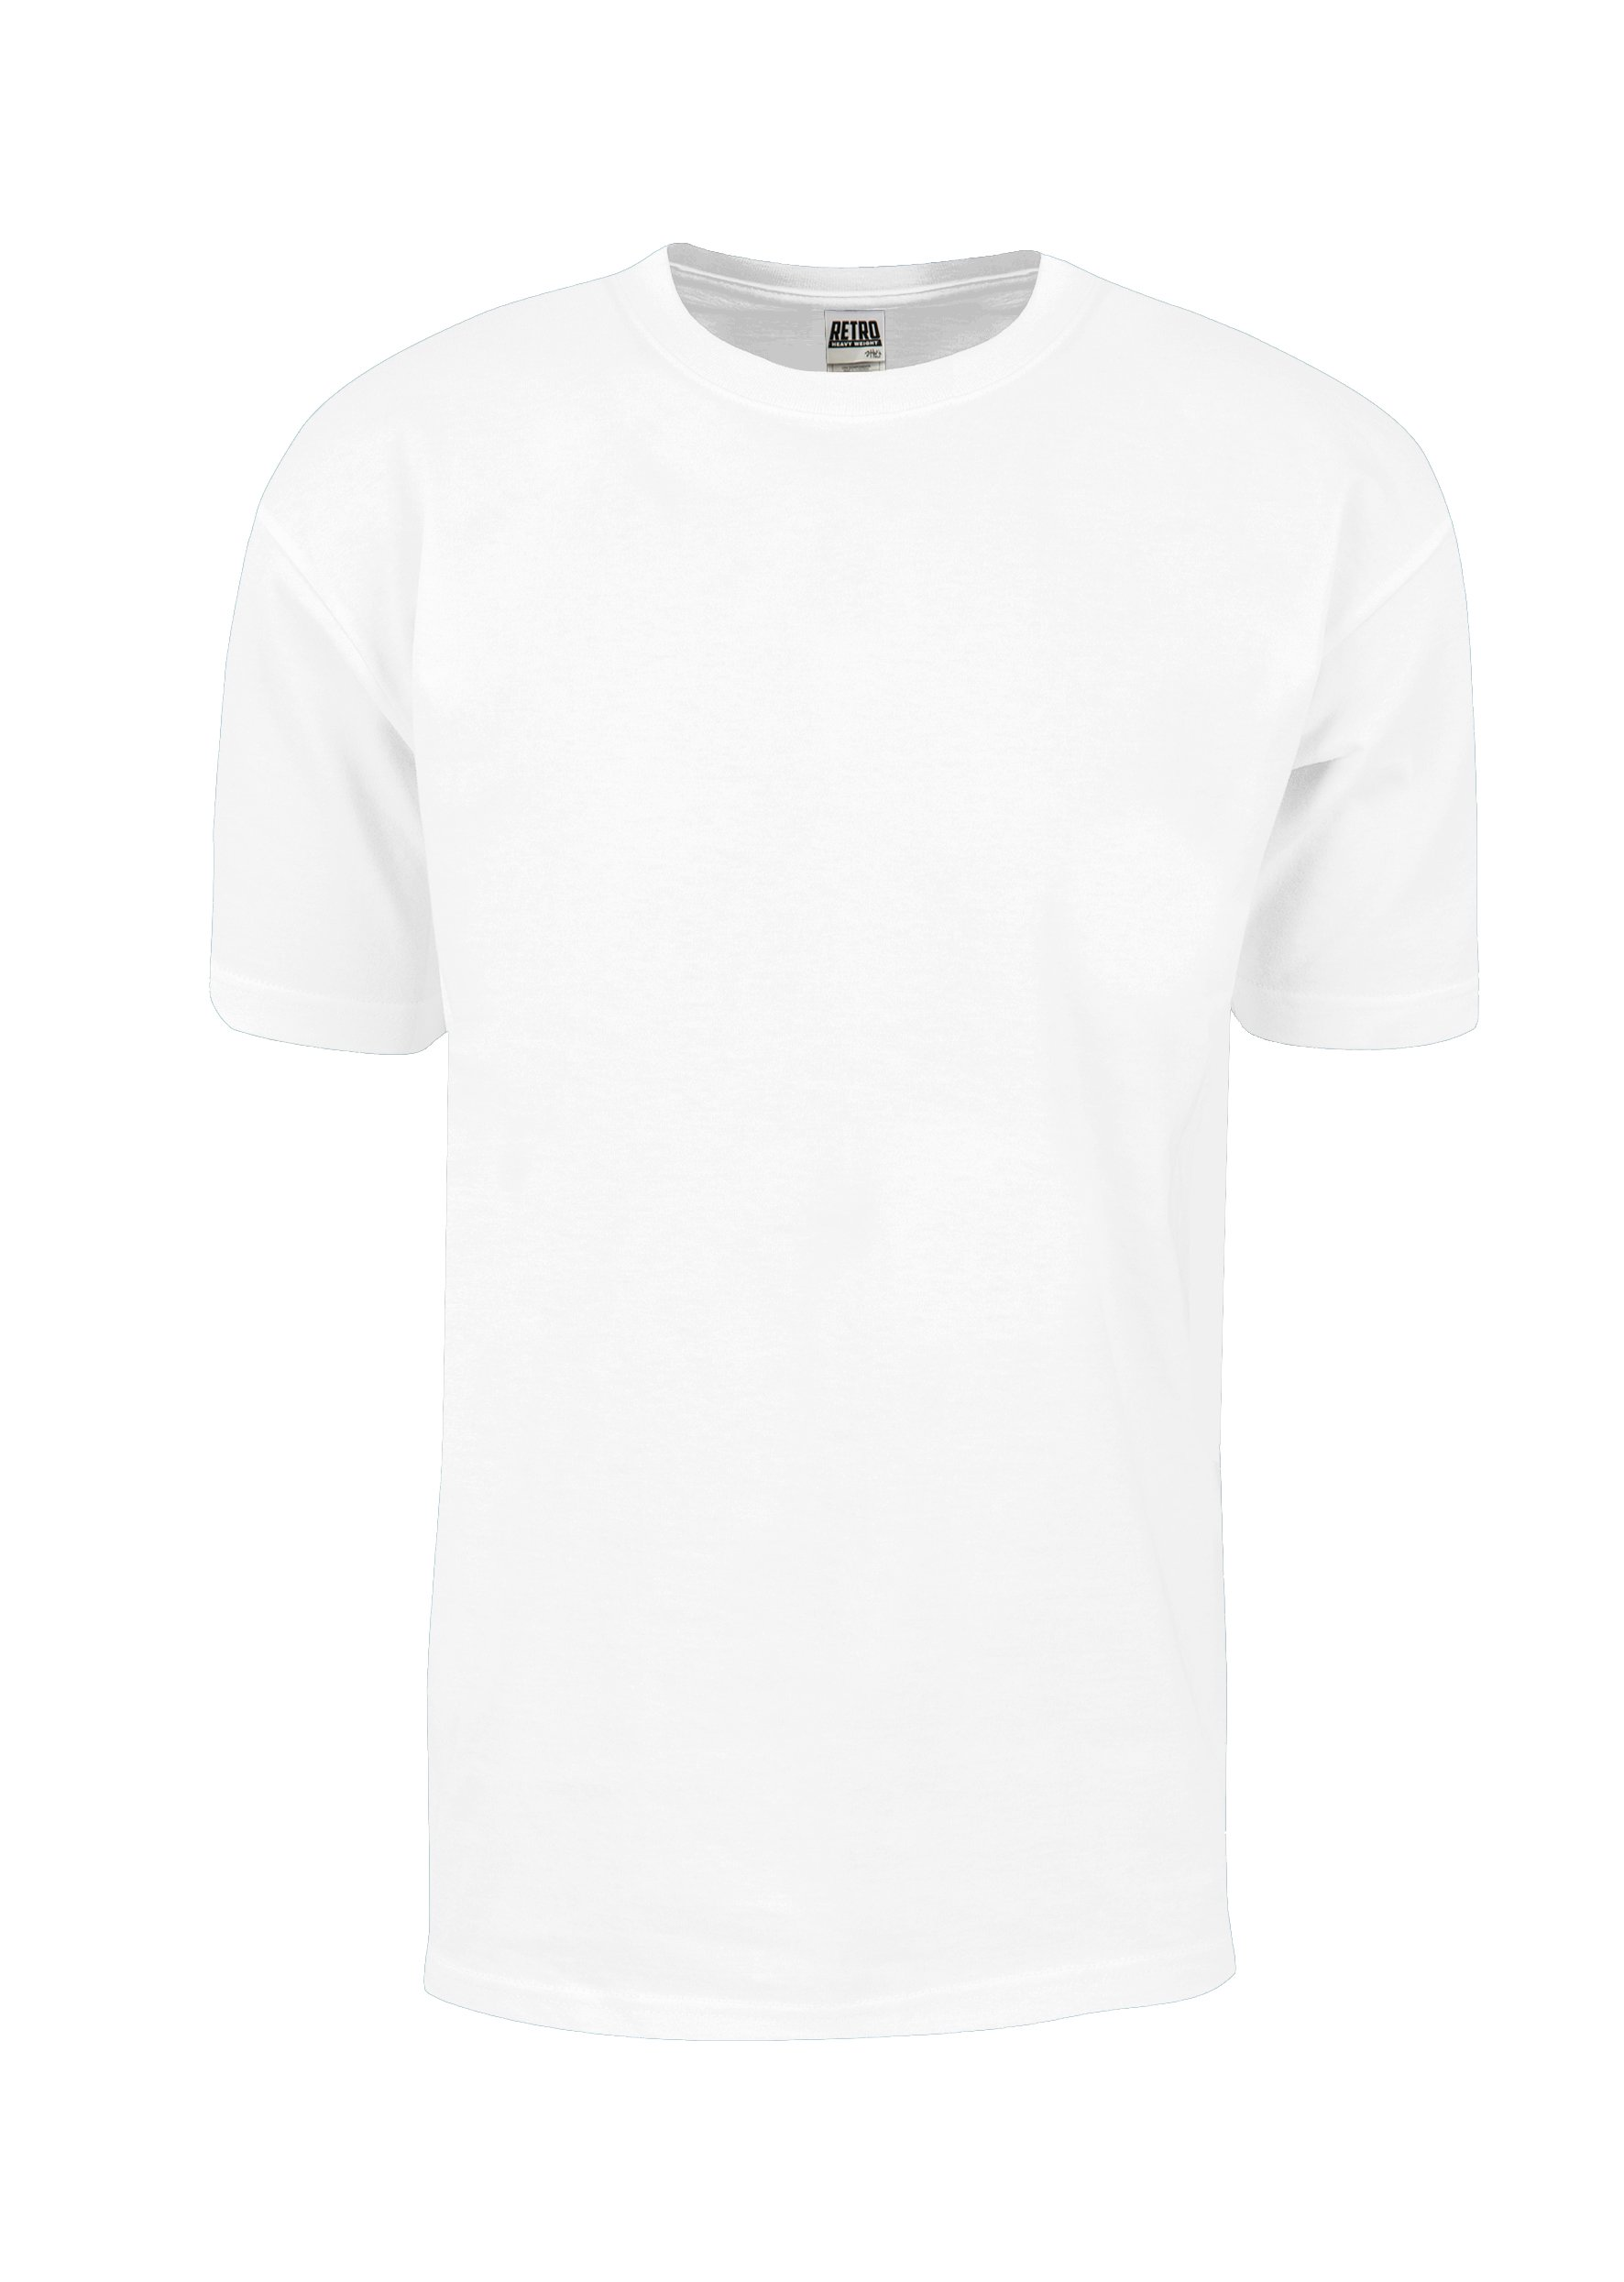 RHS01_M Retro Heavy Weight Cotton Short Sleeve T-Shirt White M